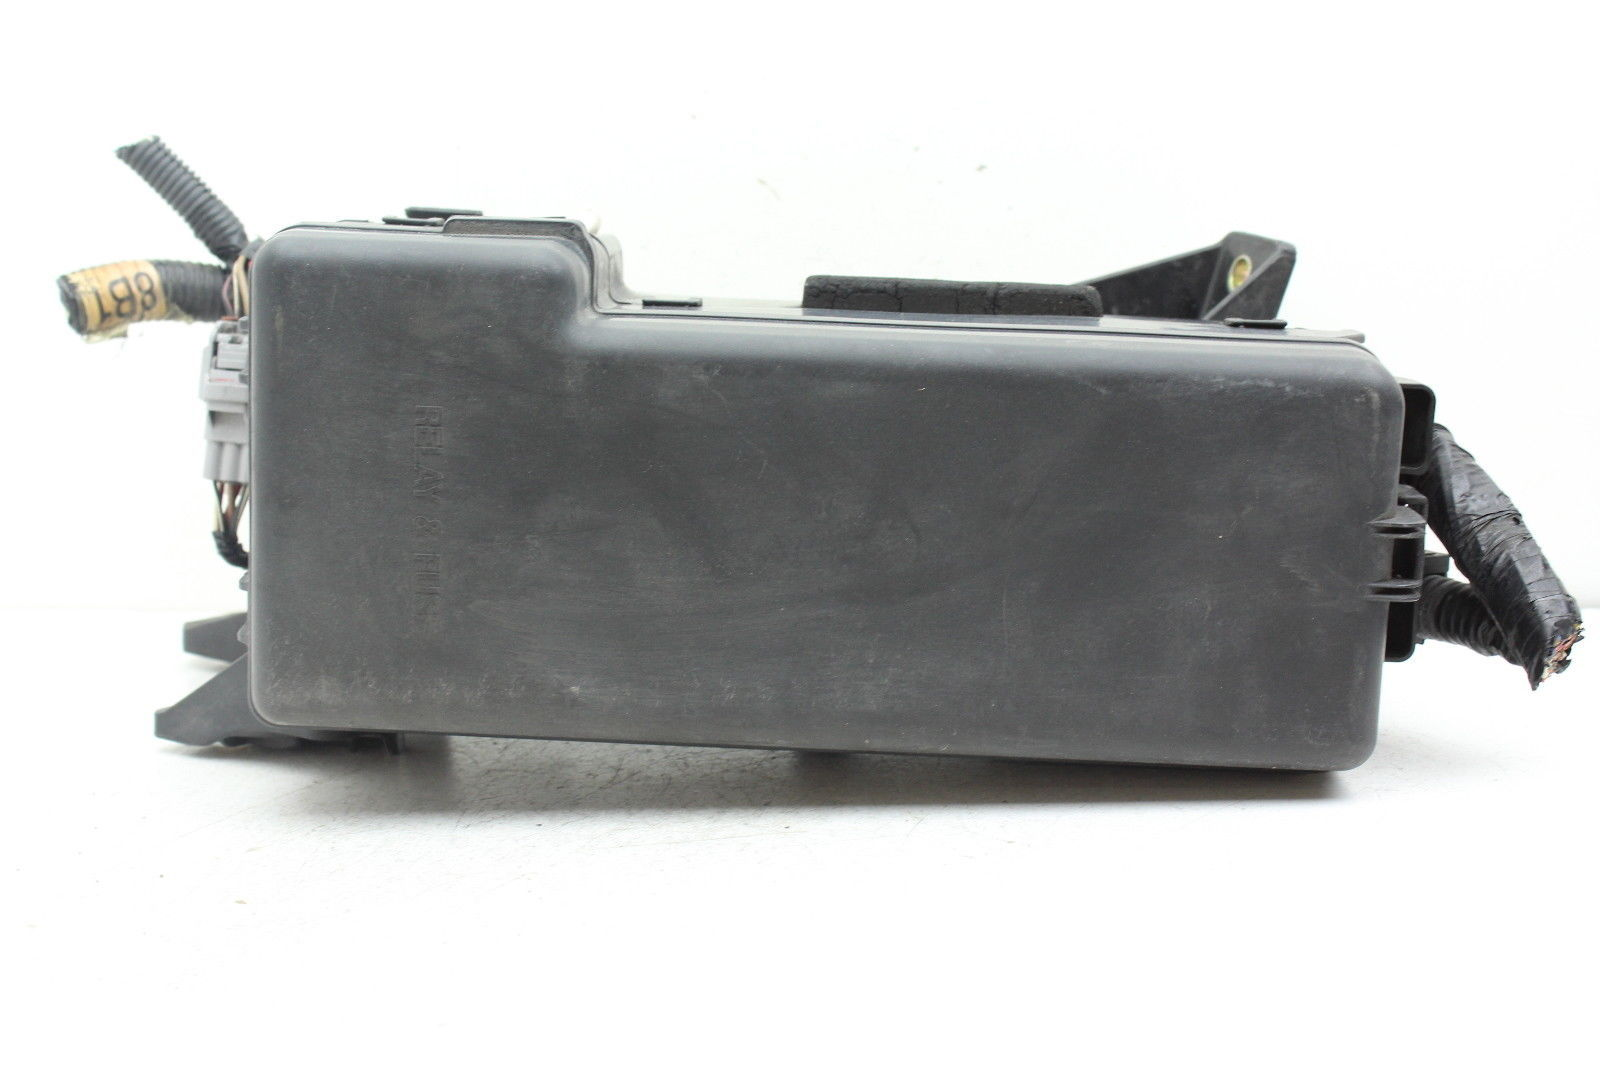 S l1600. S l1600. 04 05 06 07 Toyota Highlander 82720-48021 Fusebox ...